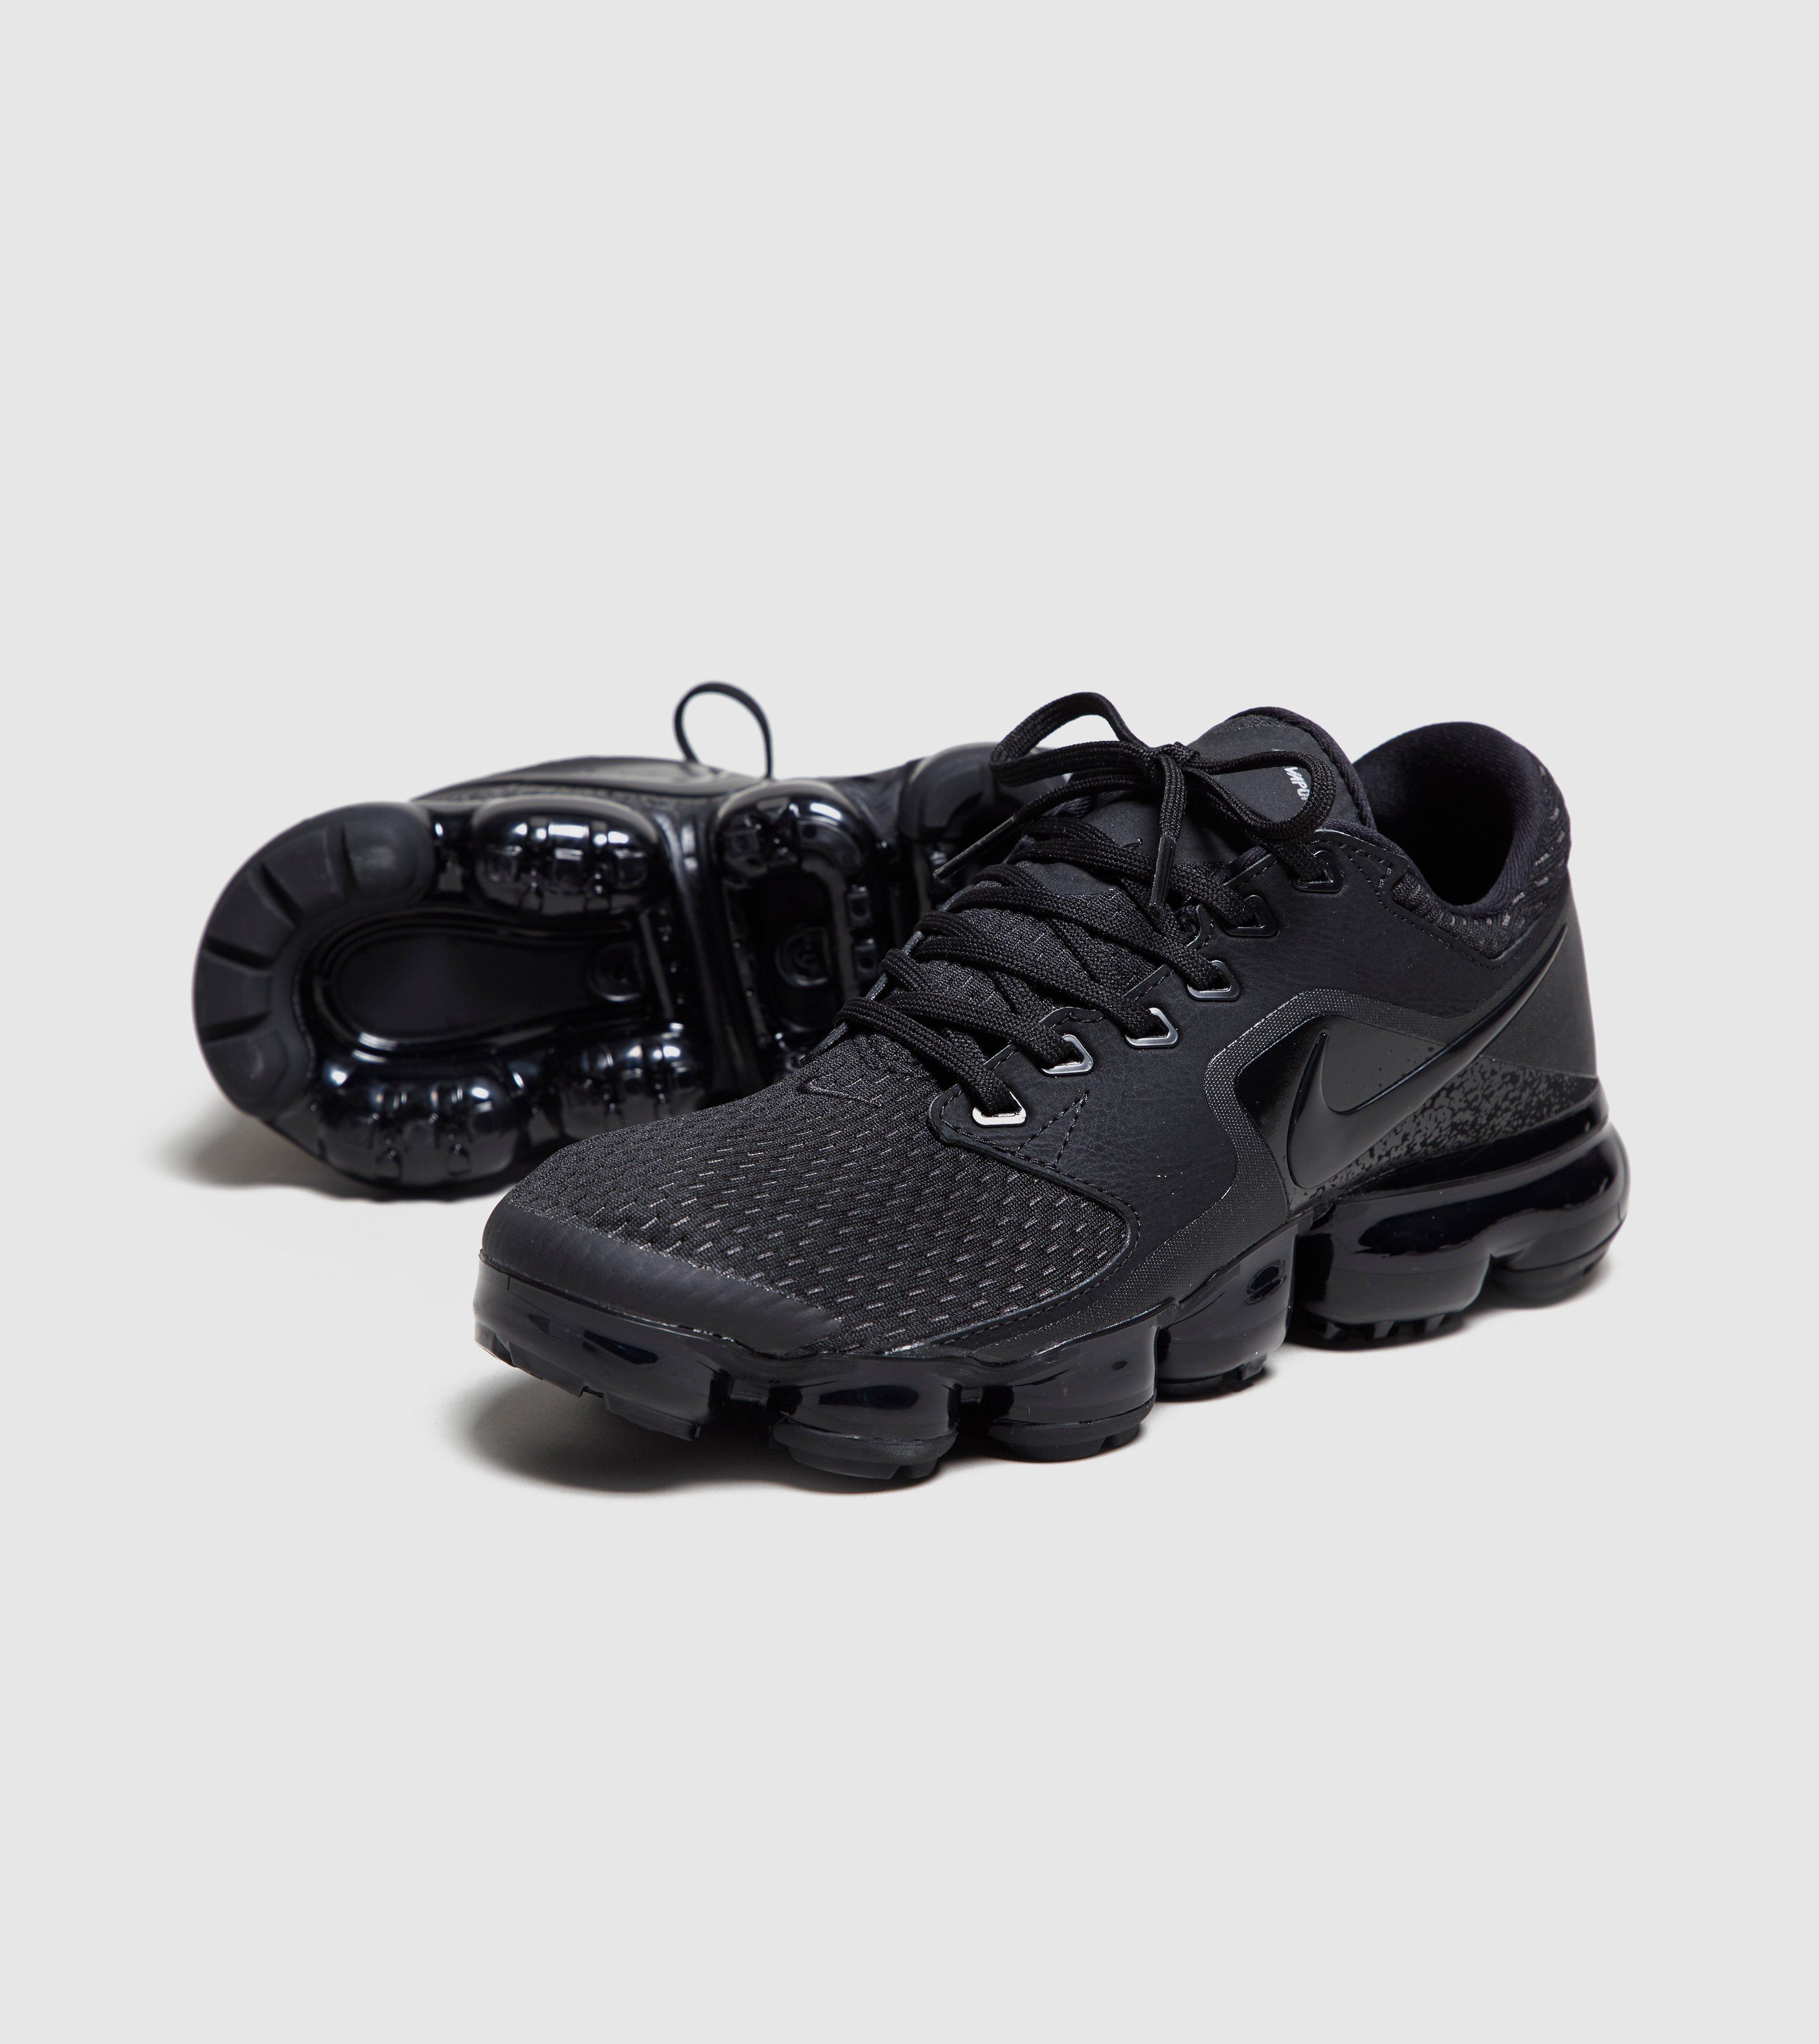 7d589af5a95b Nike Air Vapormax Mesh Women s in Black - Lyst